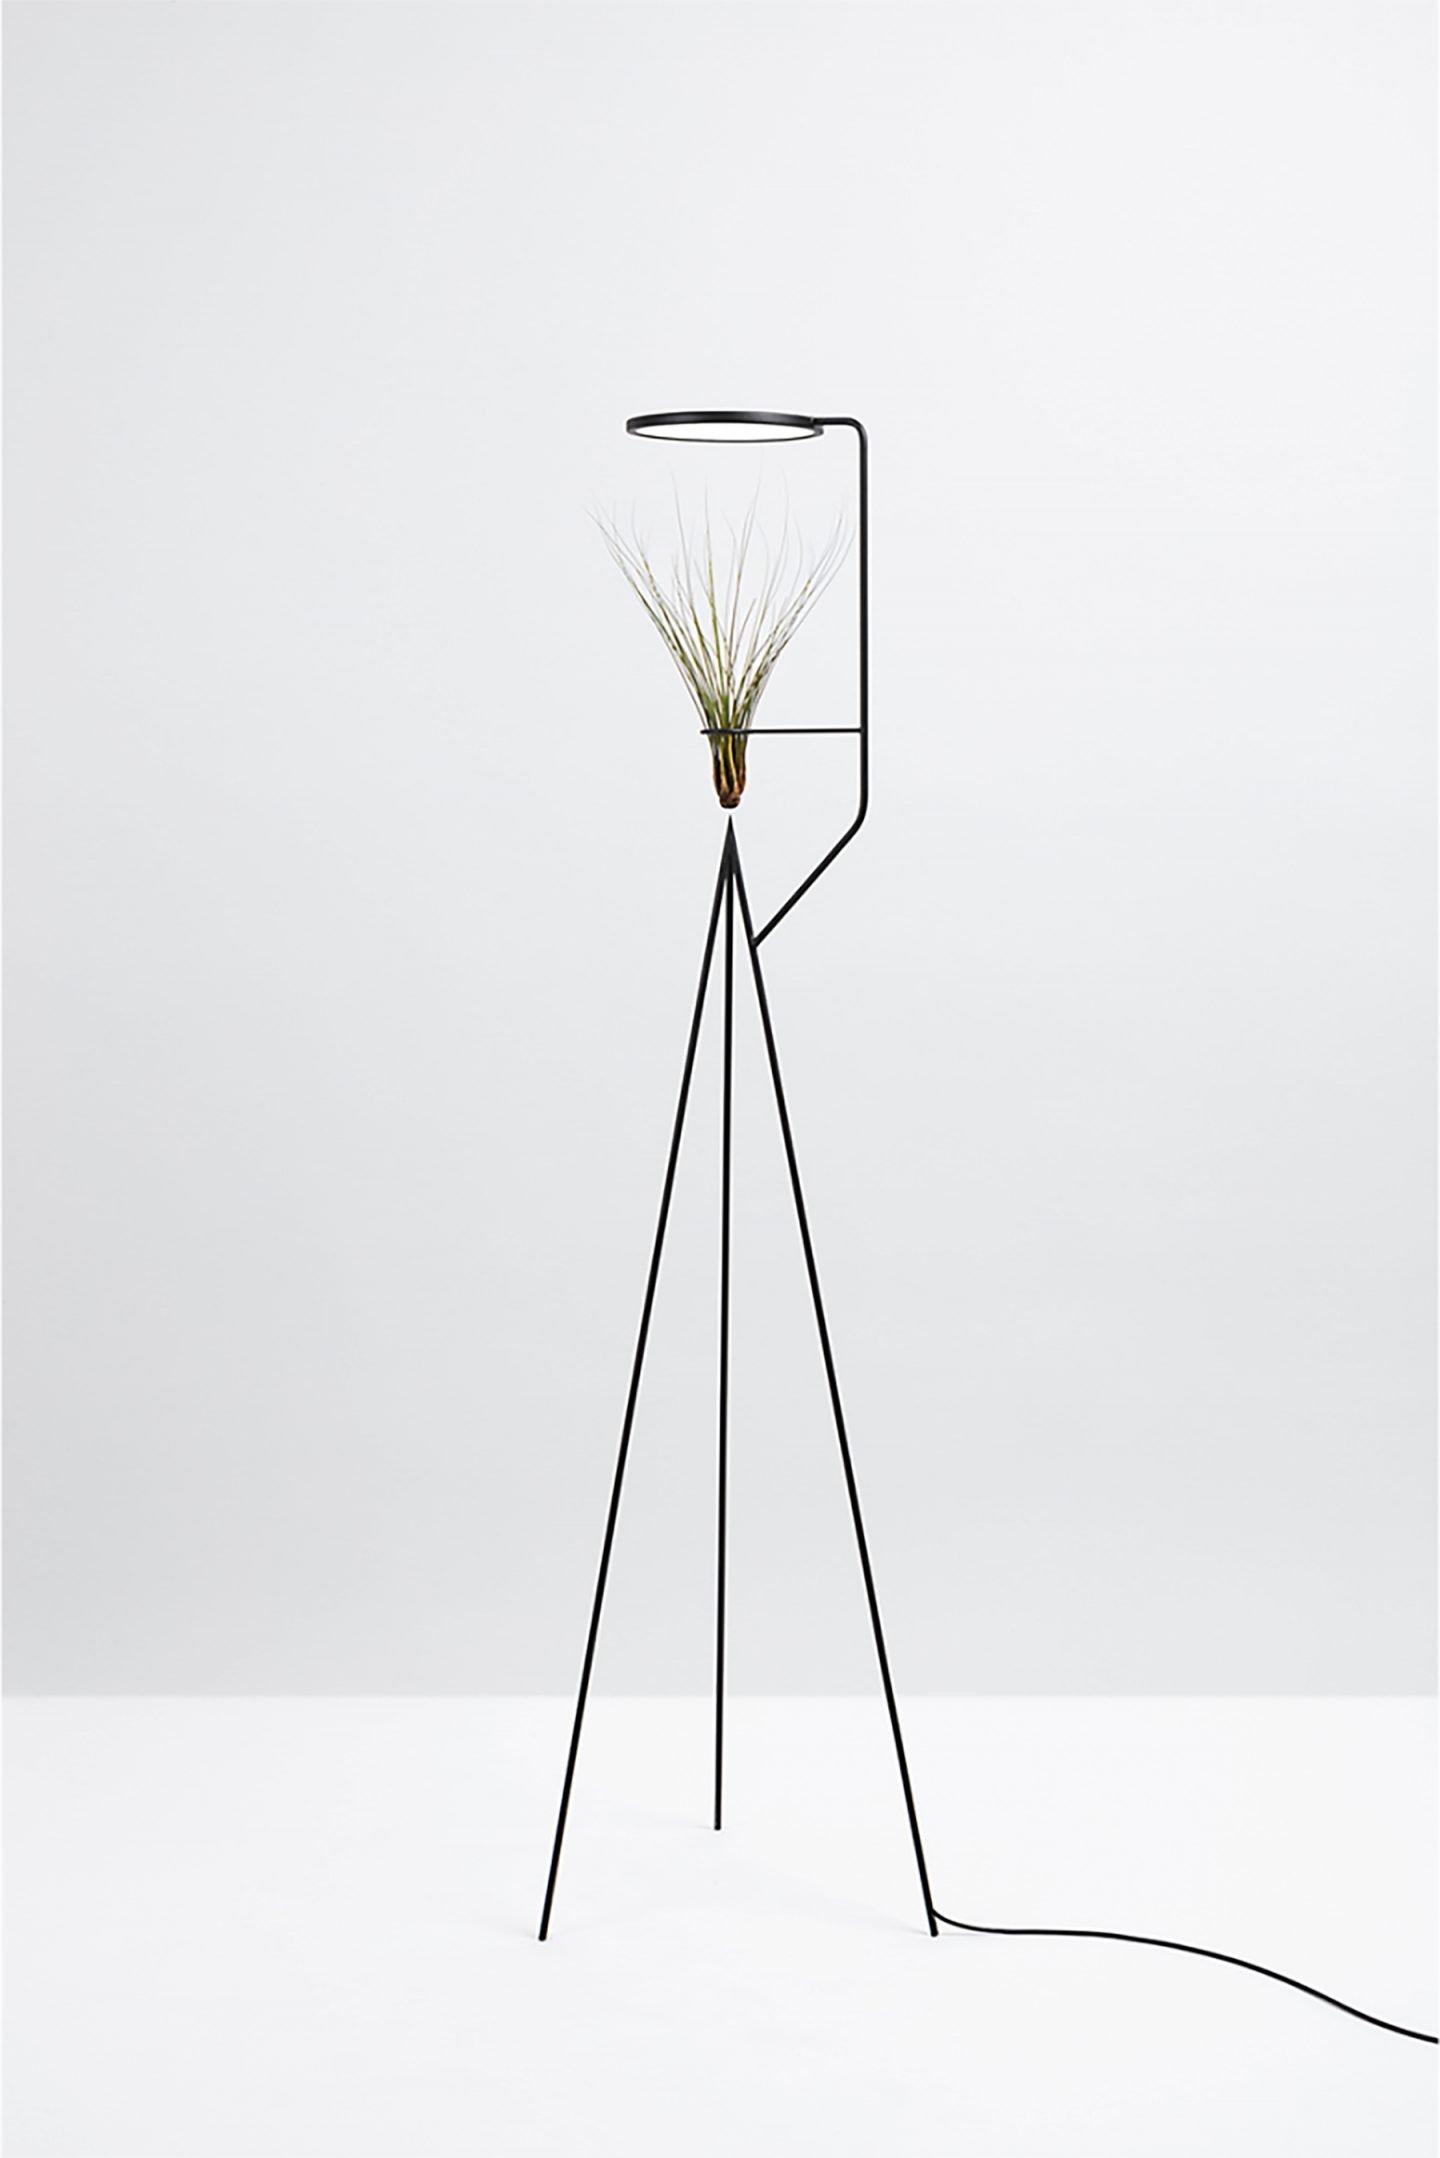 iGNANT-Design-Goula-Figuera-Viride-06 copy